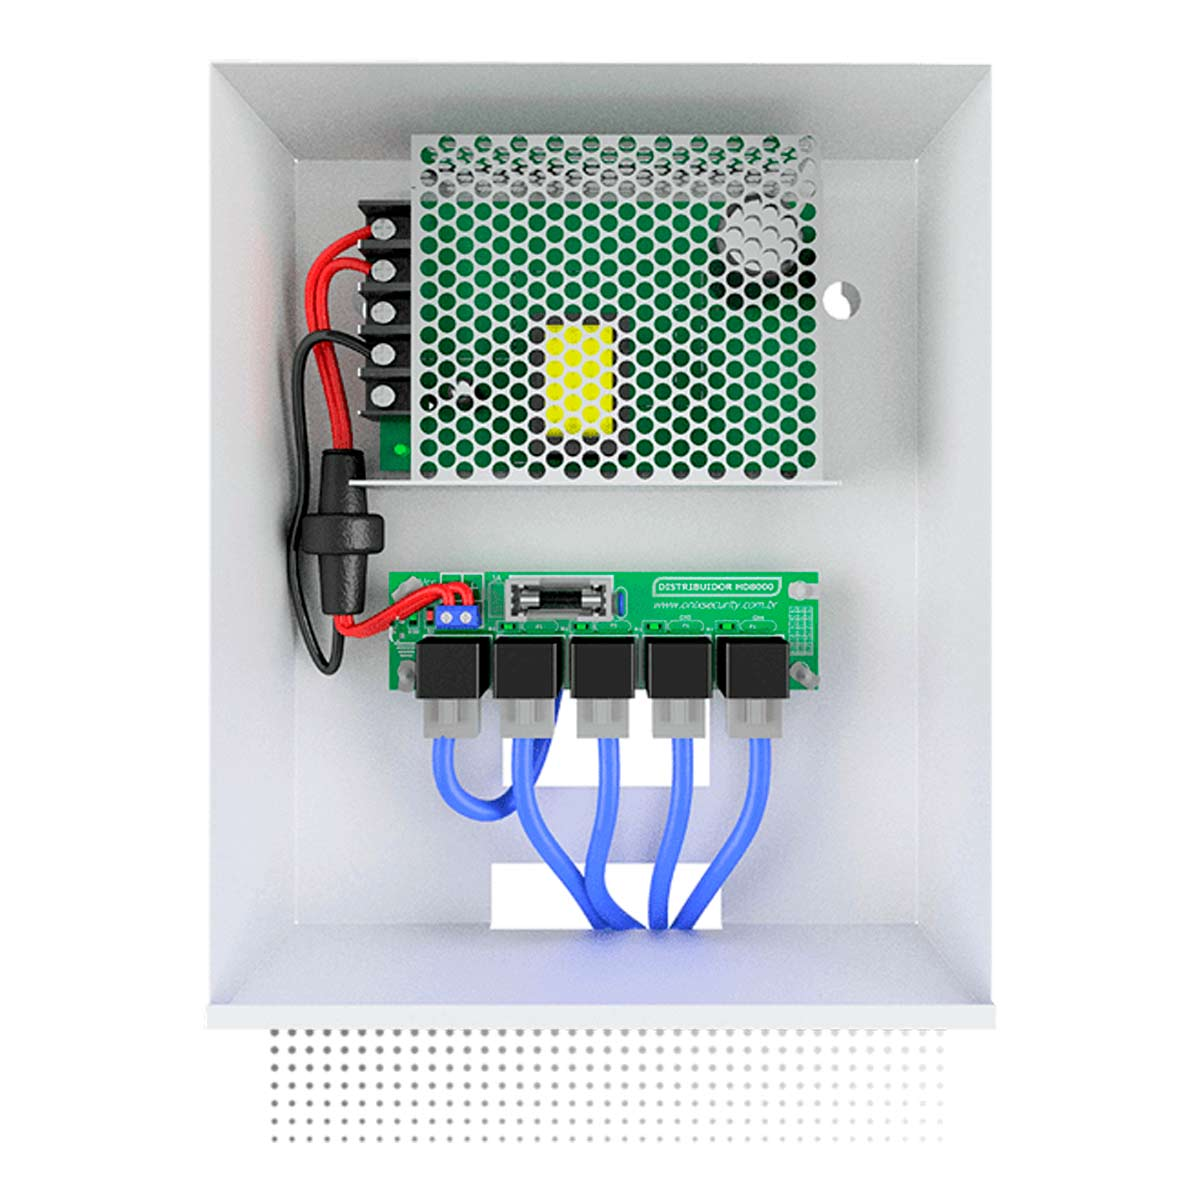 Bandeja-Fixa-para-Rack-5U-Onix-Security-1U-x-250mm